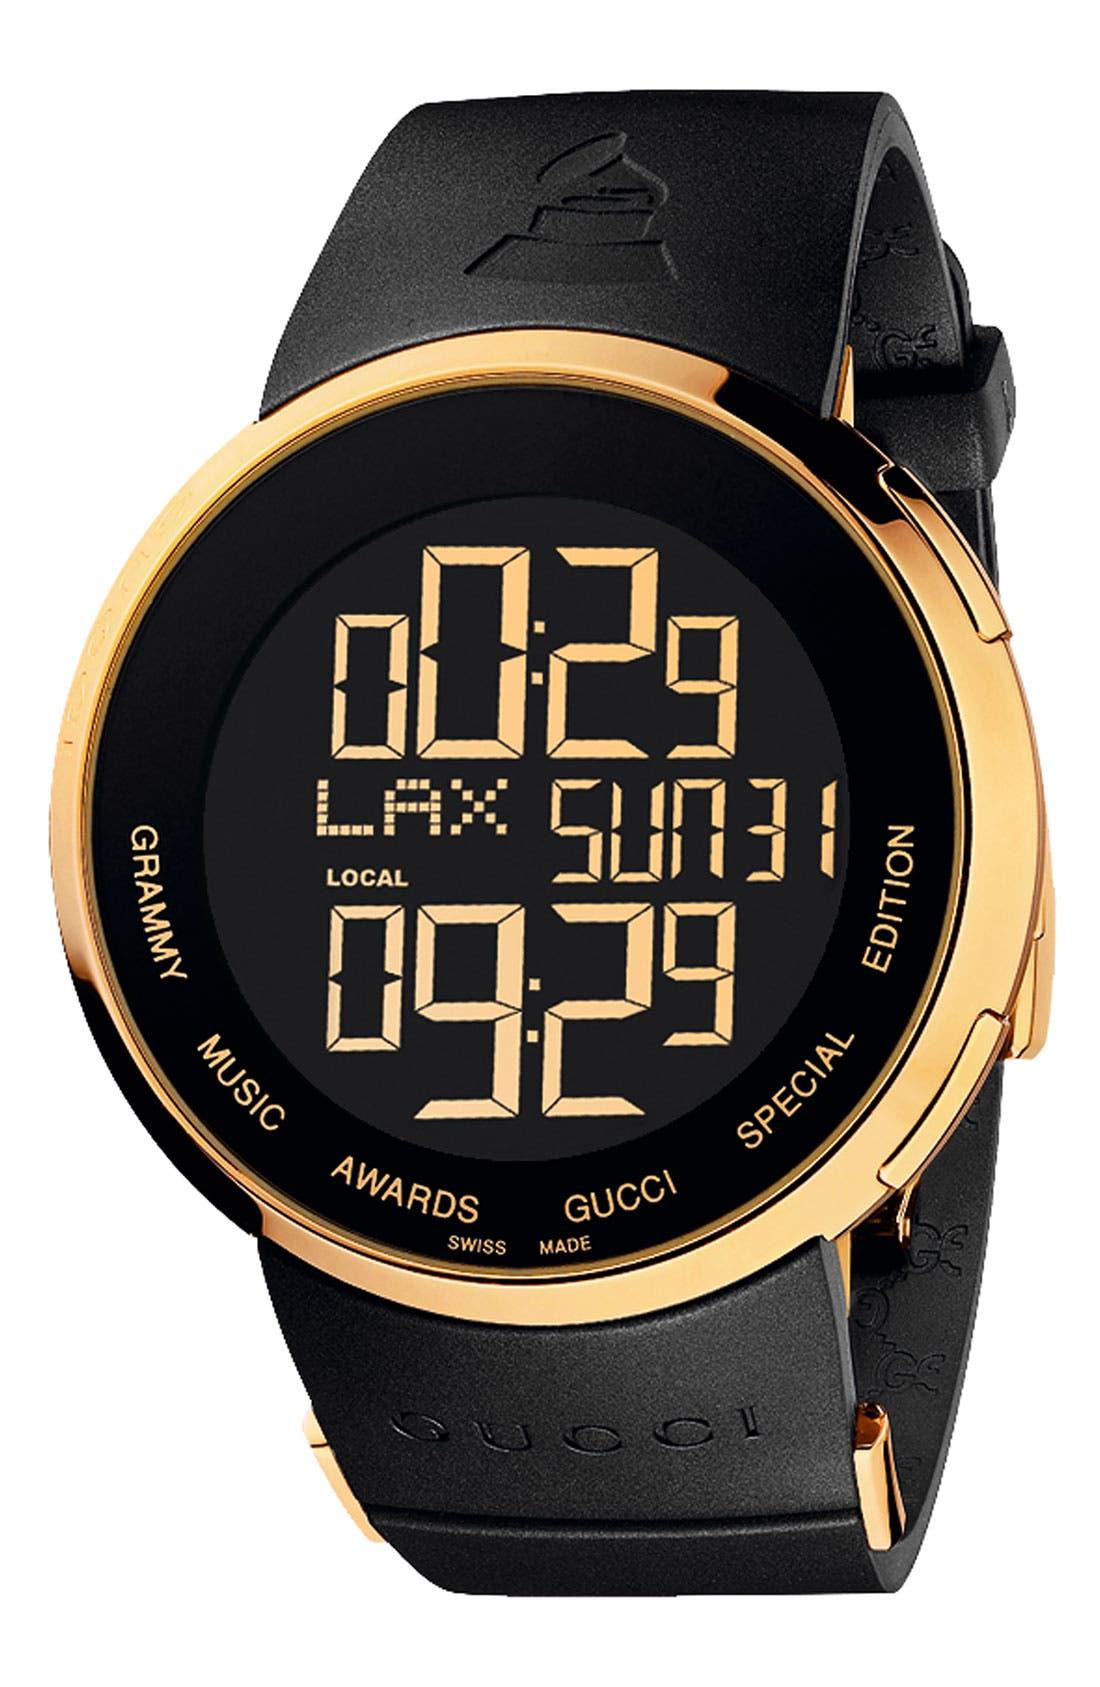 Main Image - Gucci 'I Gucci - Grammy' Digital Watch, 44mm